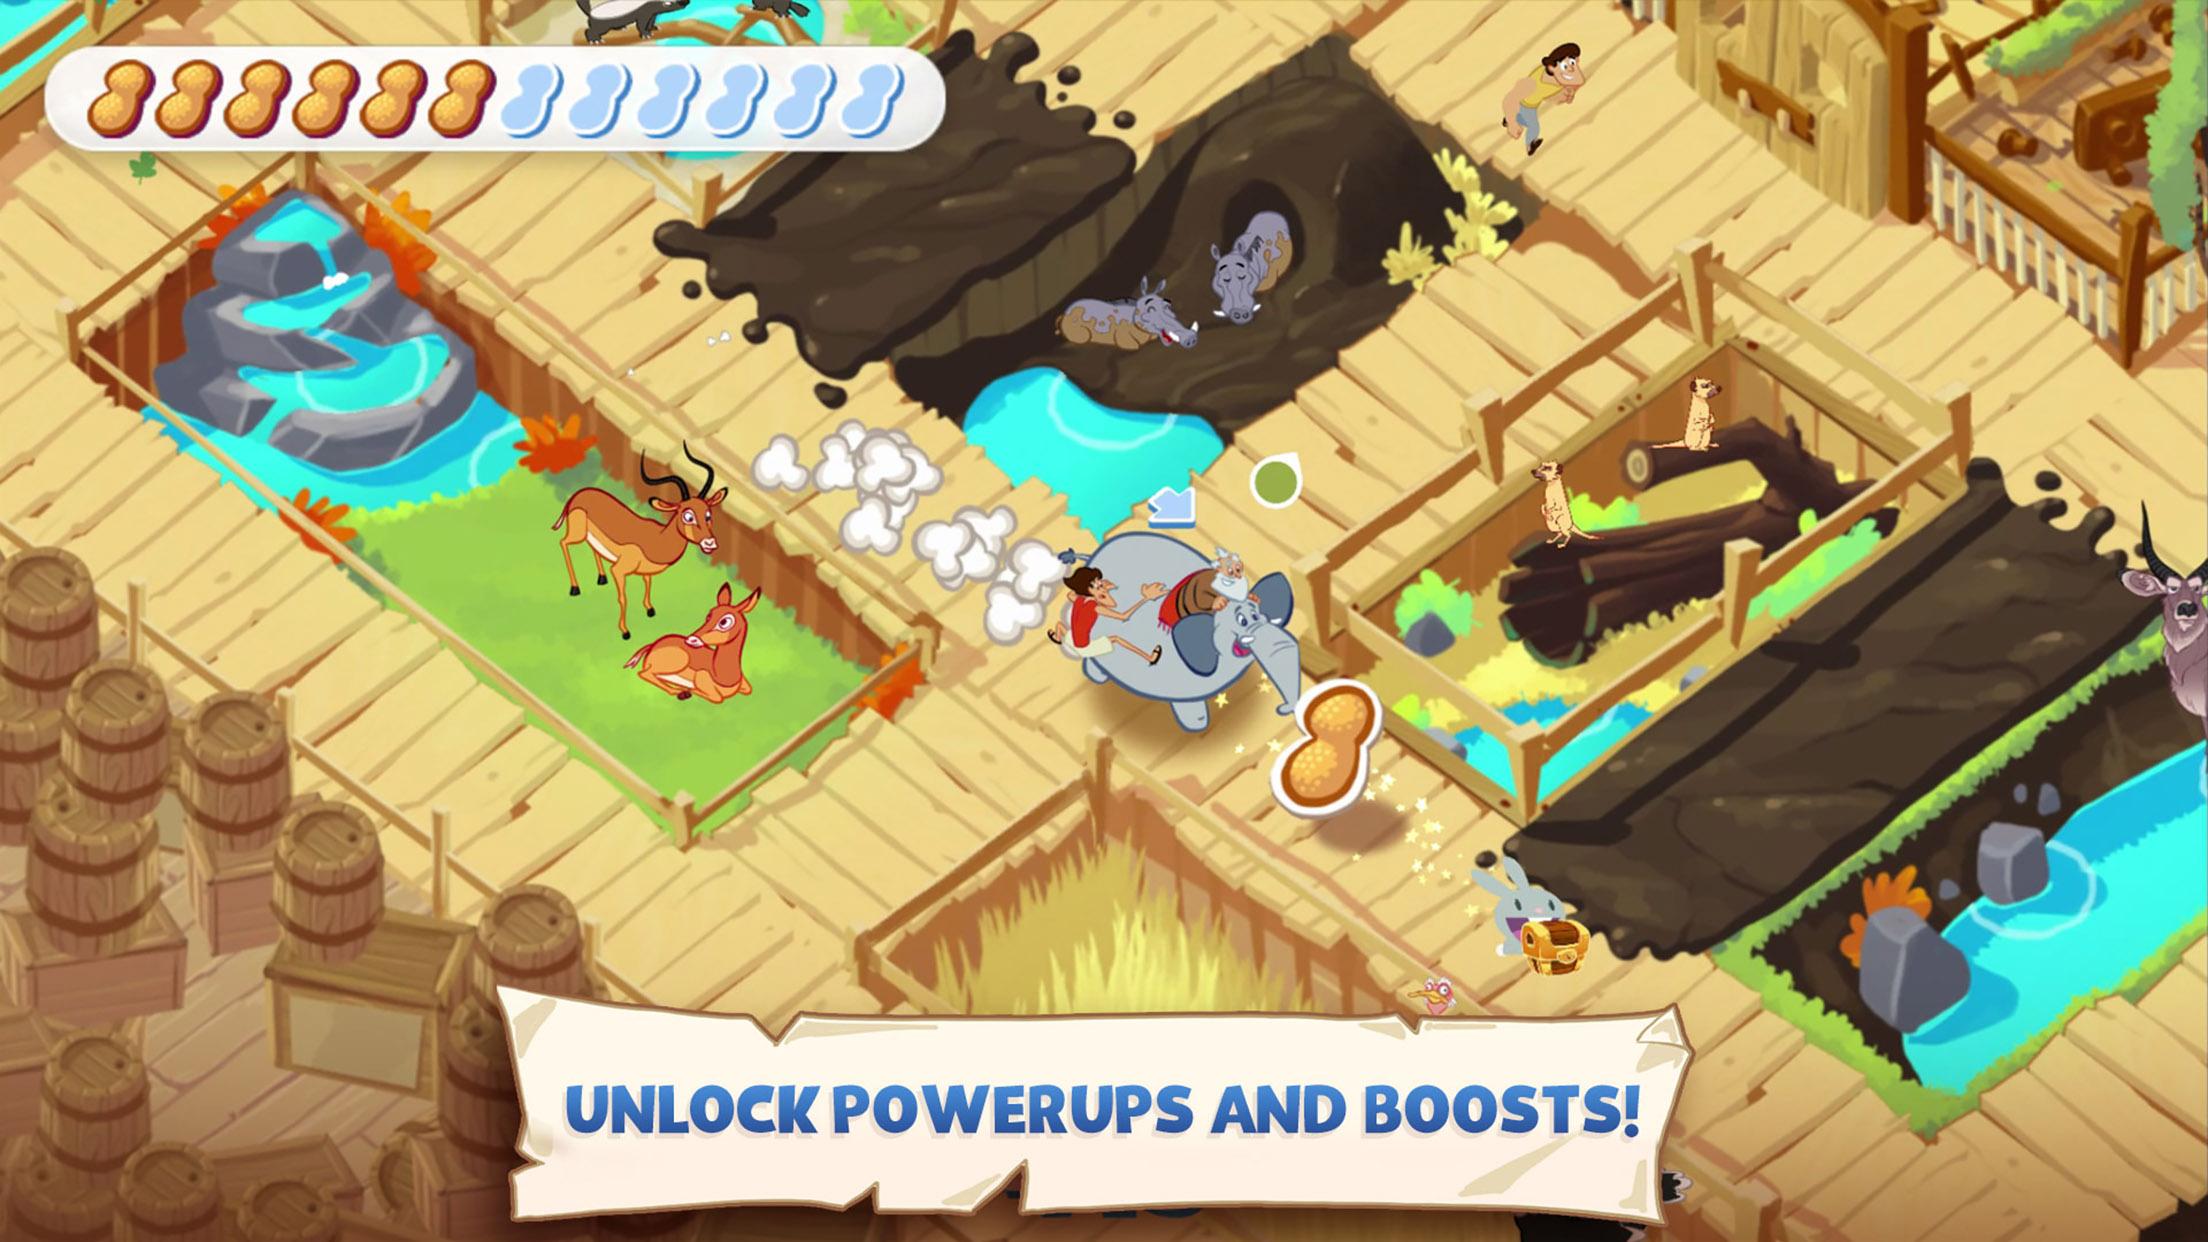 2-UnlockPowerups.jpg